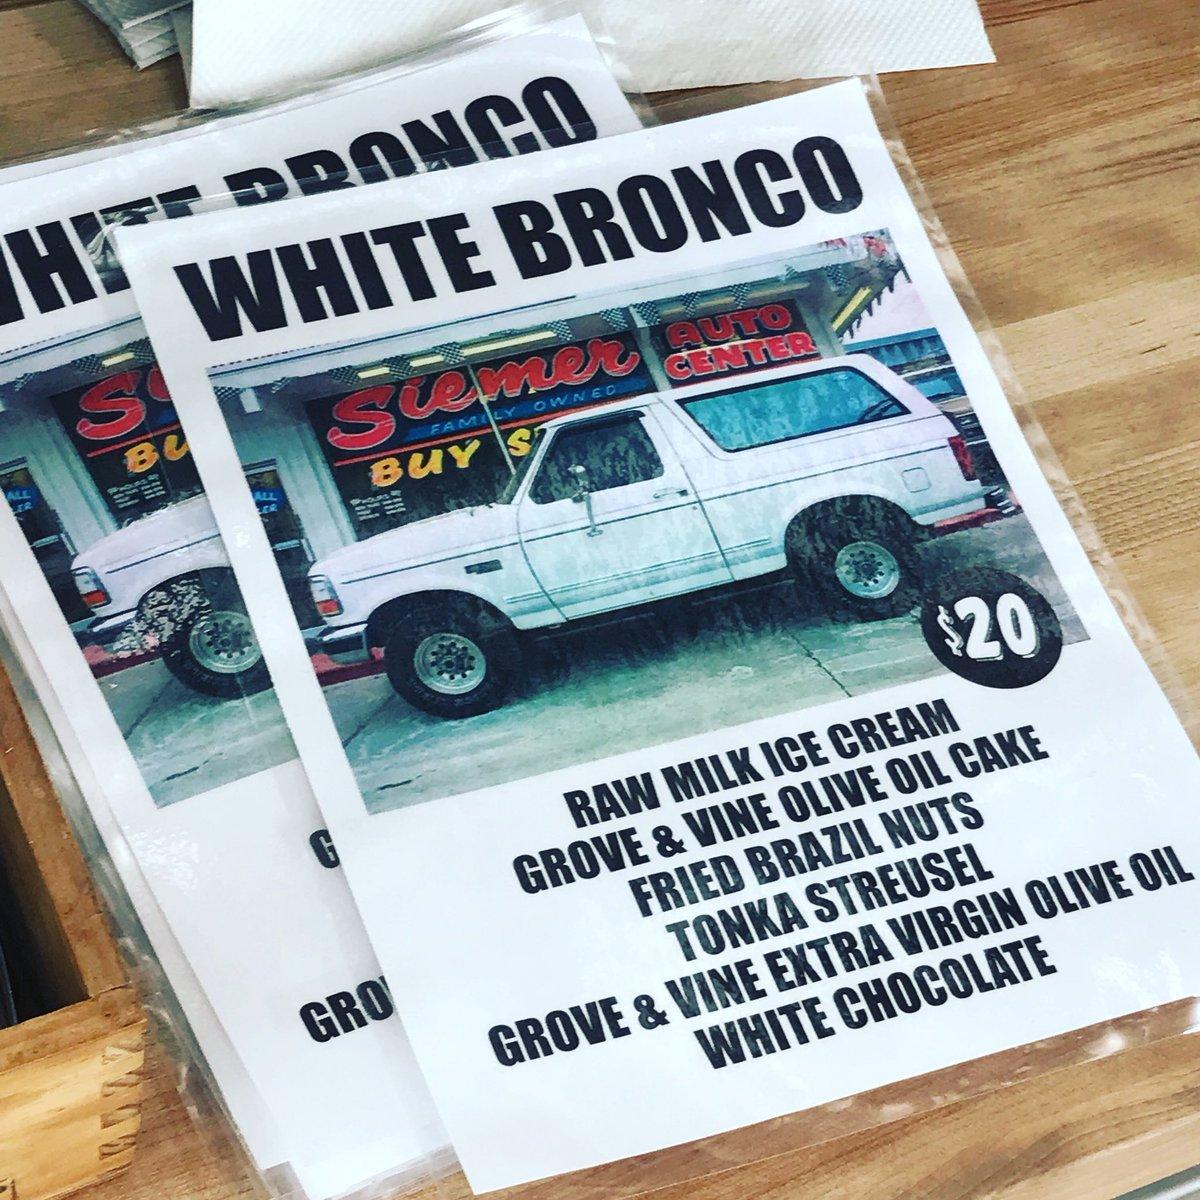 RT @oleologist: It's here...The White Bronco Ice Cream!!!  Only @MorgensternsNY via @ActionBronson  #groveandvine https://t.co/M6Eb0WzDGN